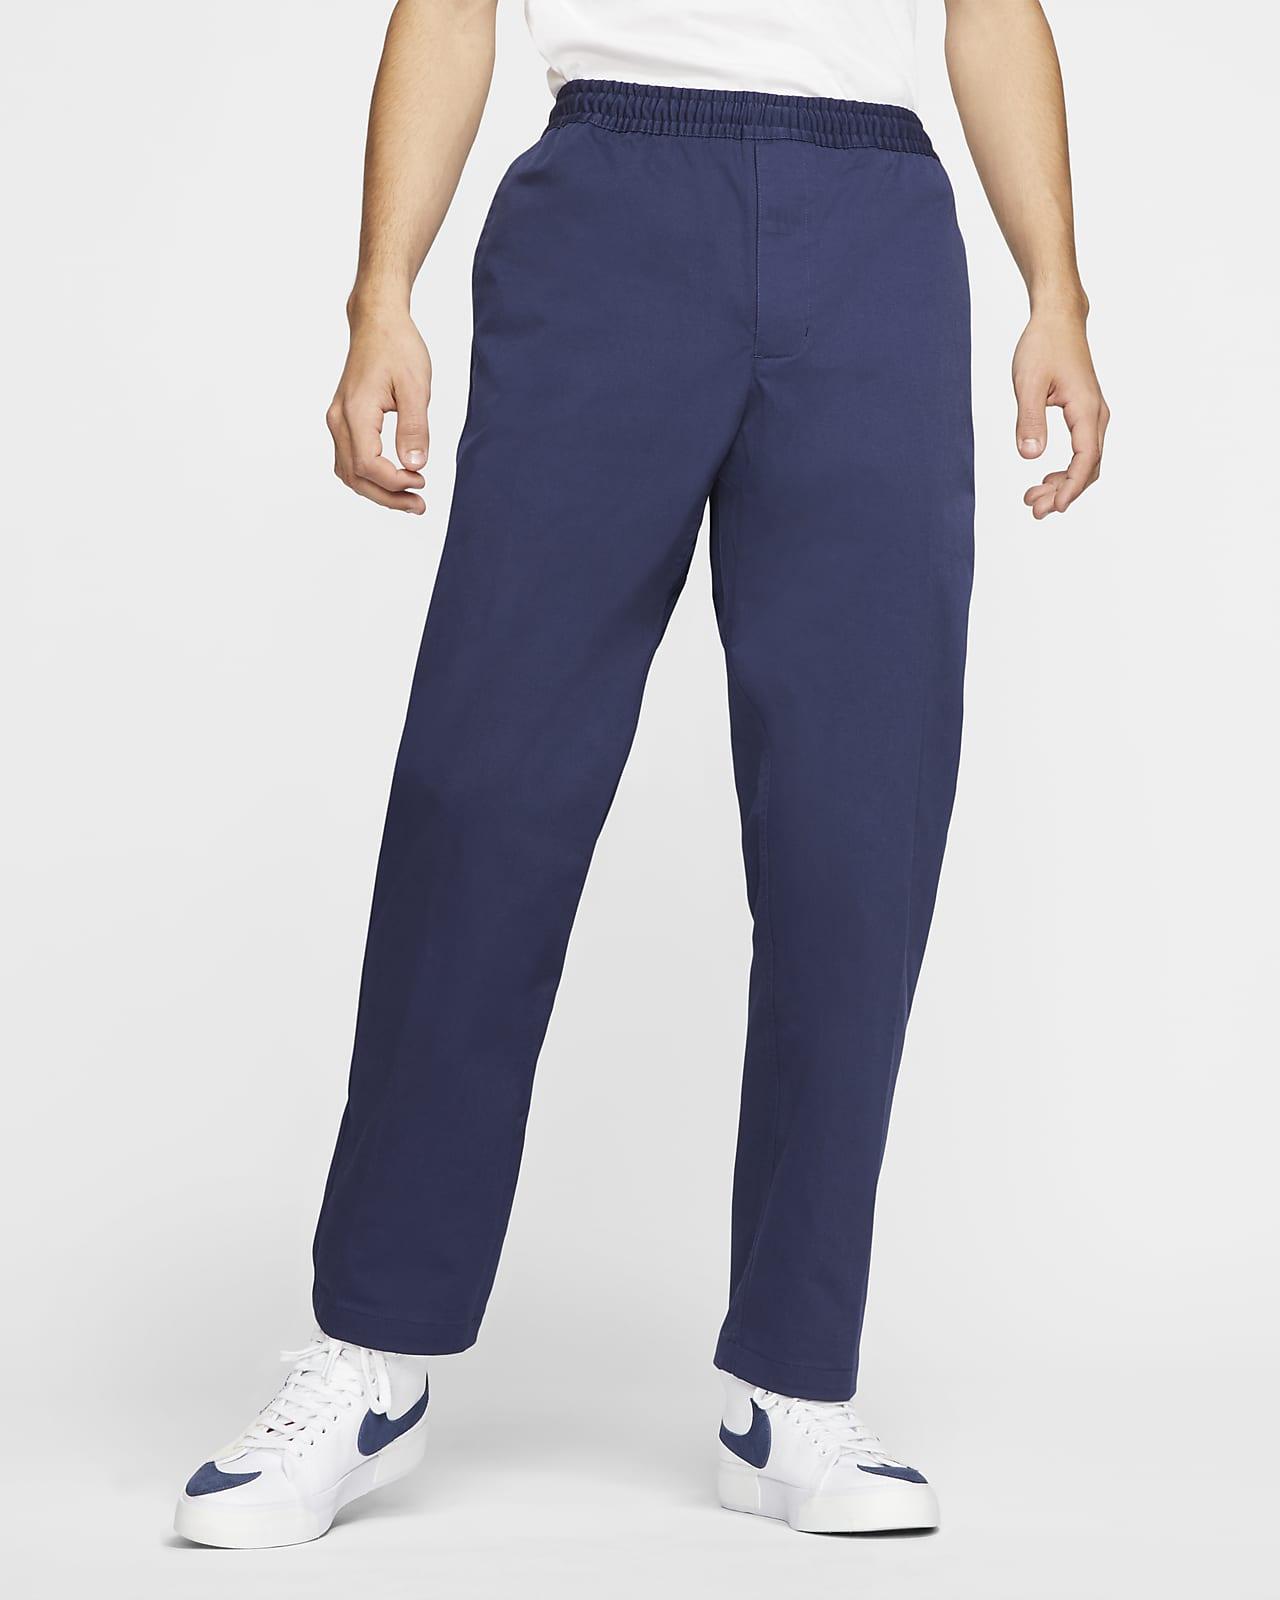 Pantalones Chinos De Skate Para Hombre Nike Sb Dri Fit Nike Cl